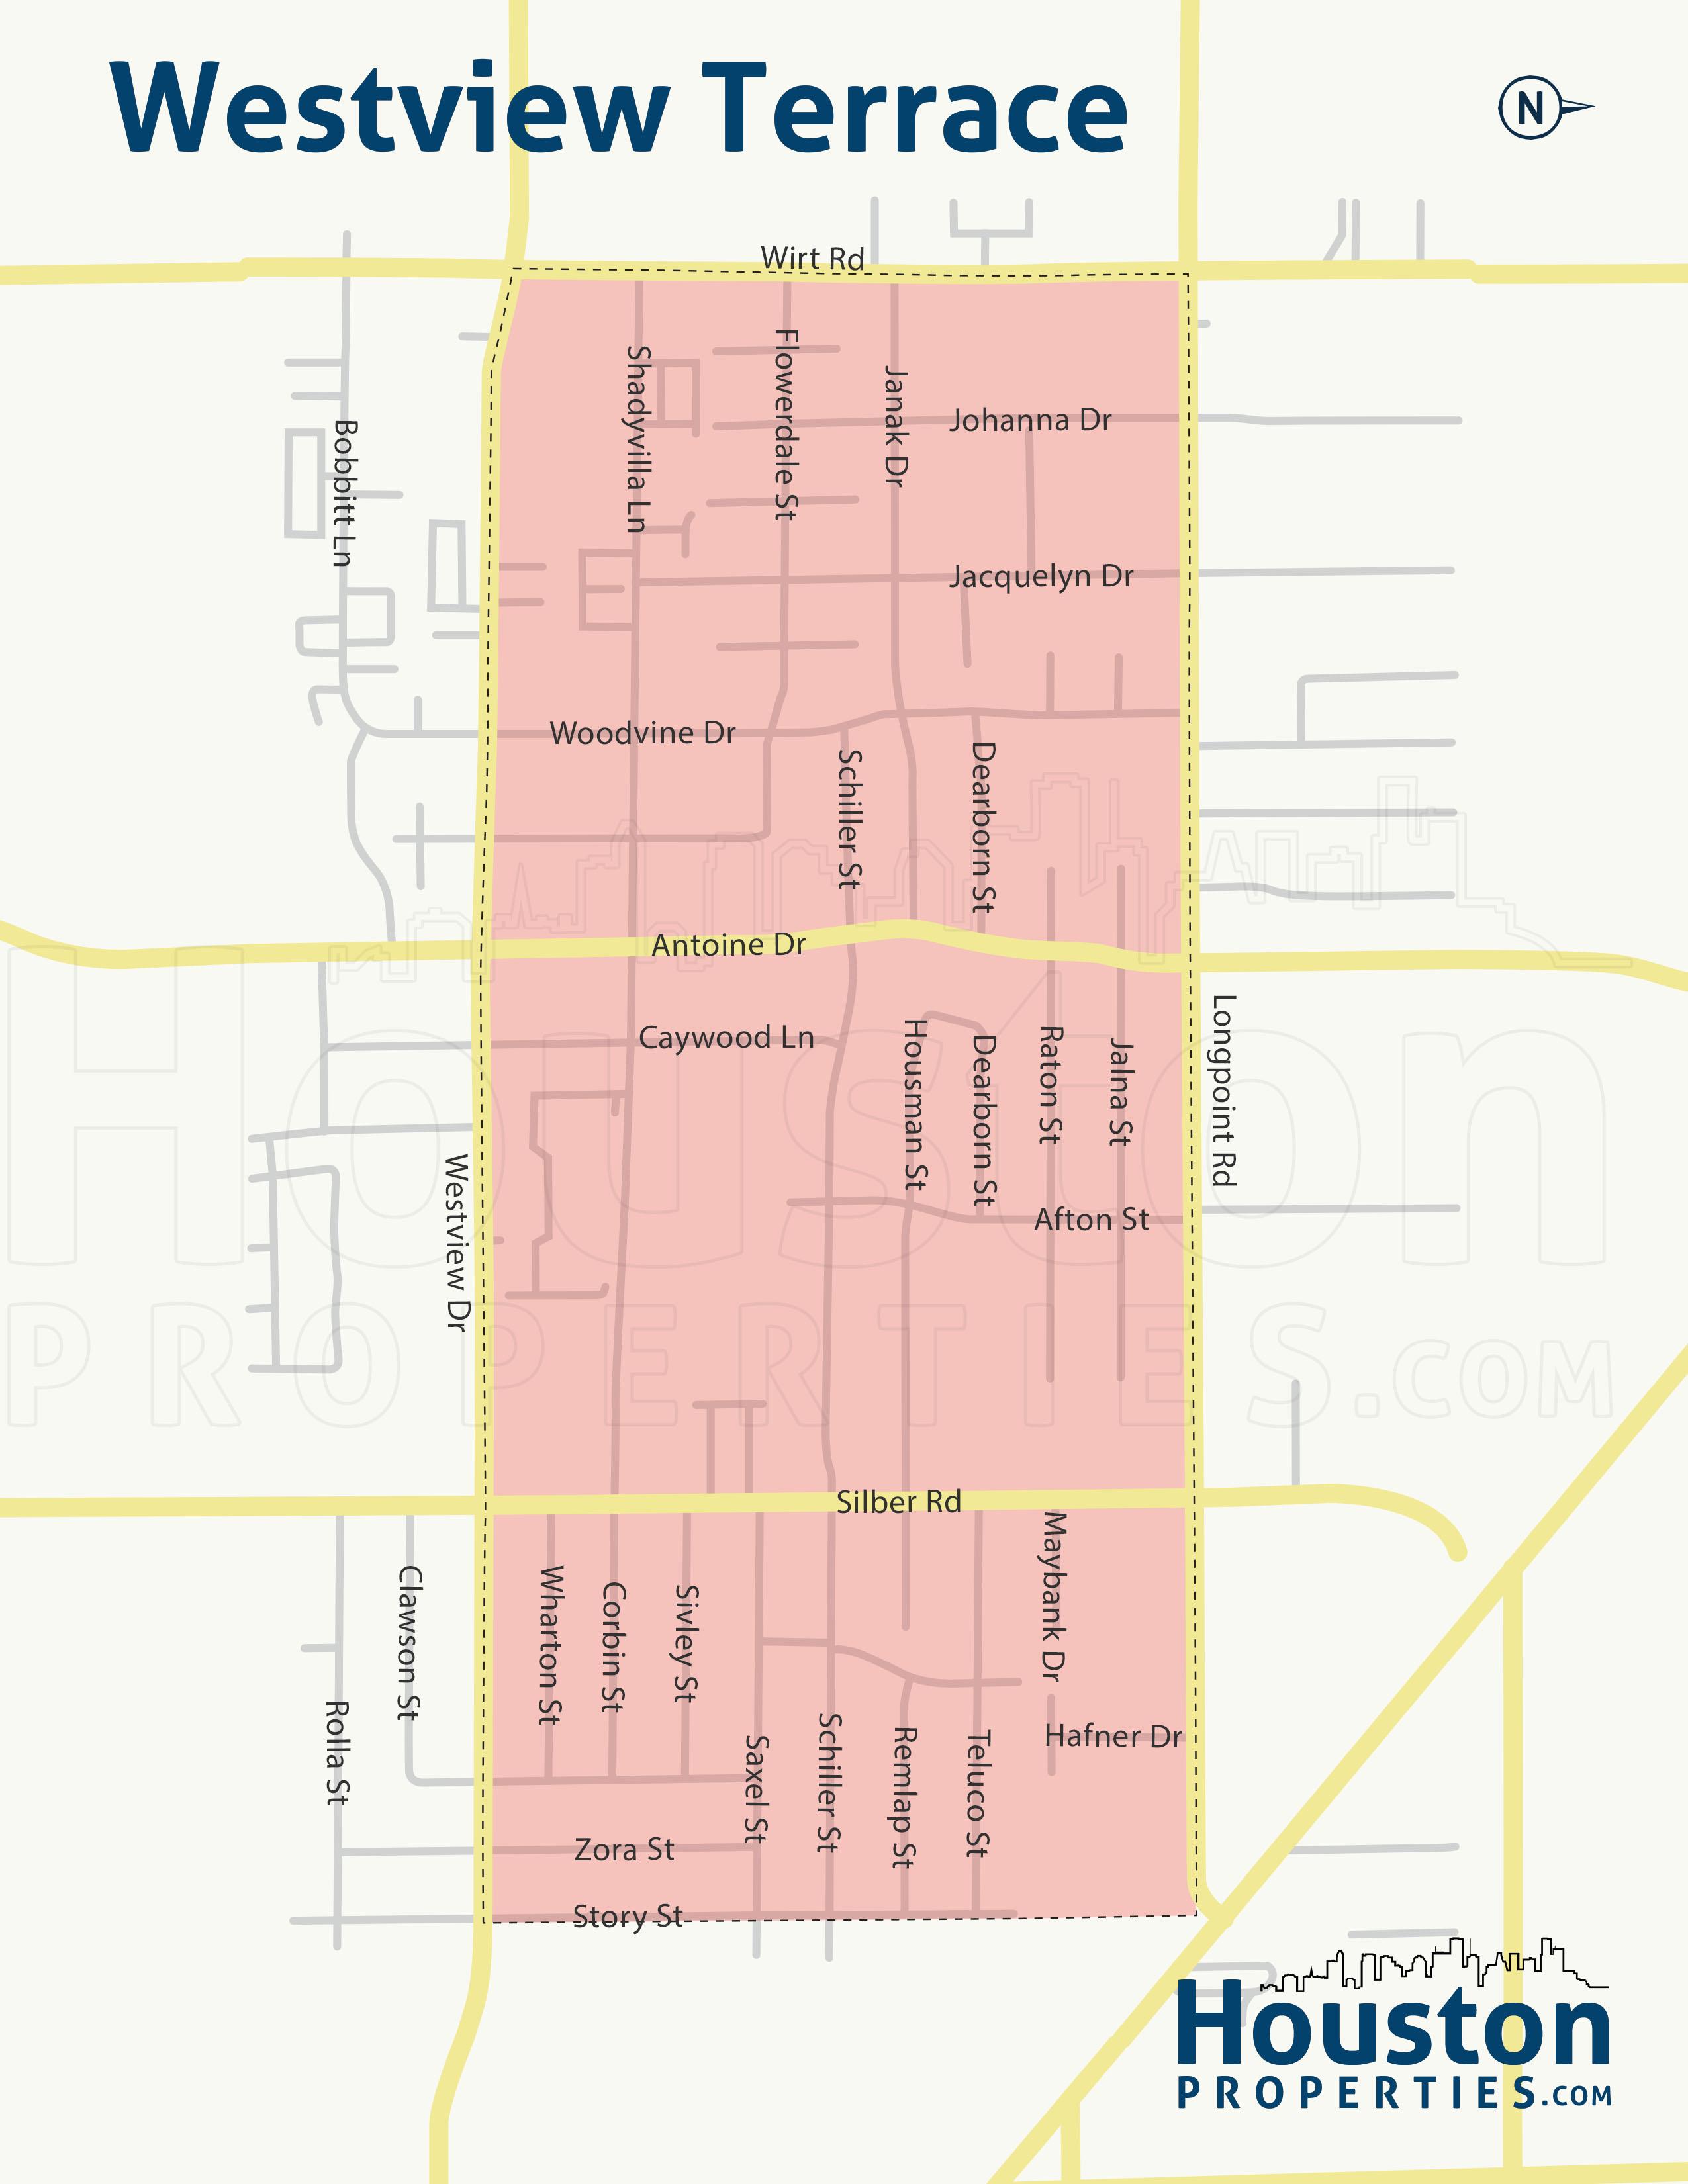 Westview Terrace neighborhood map